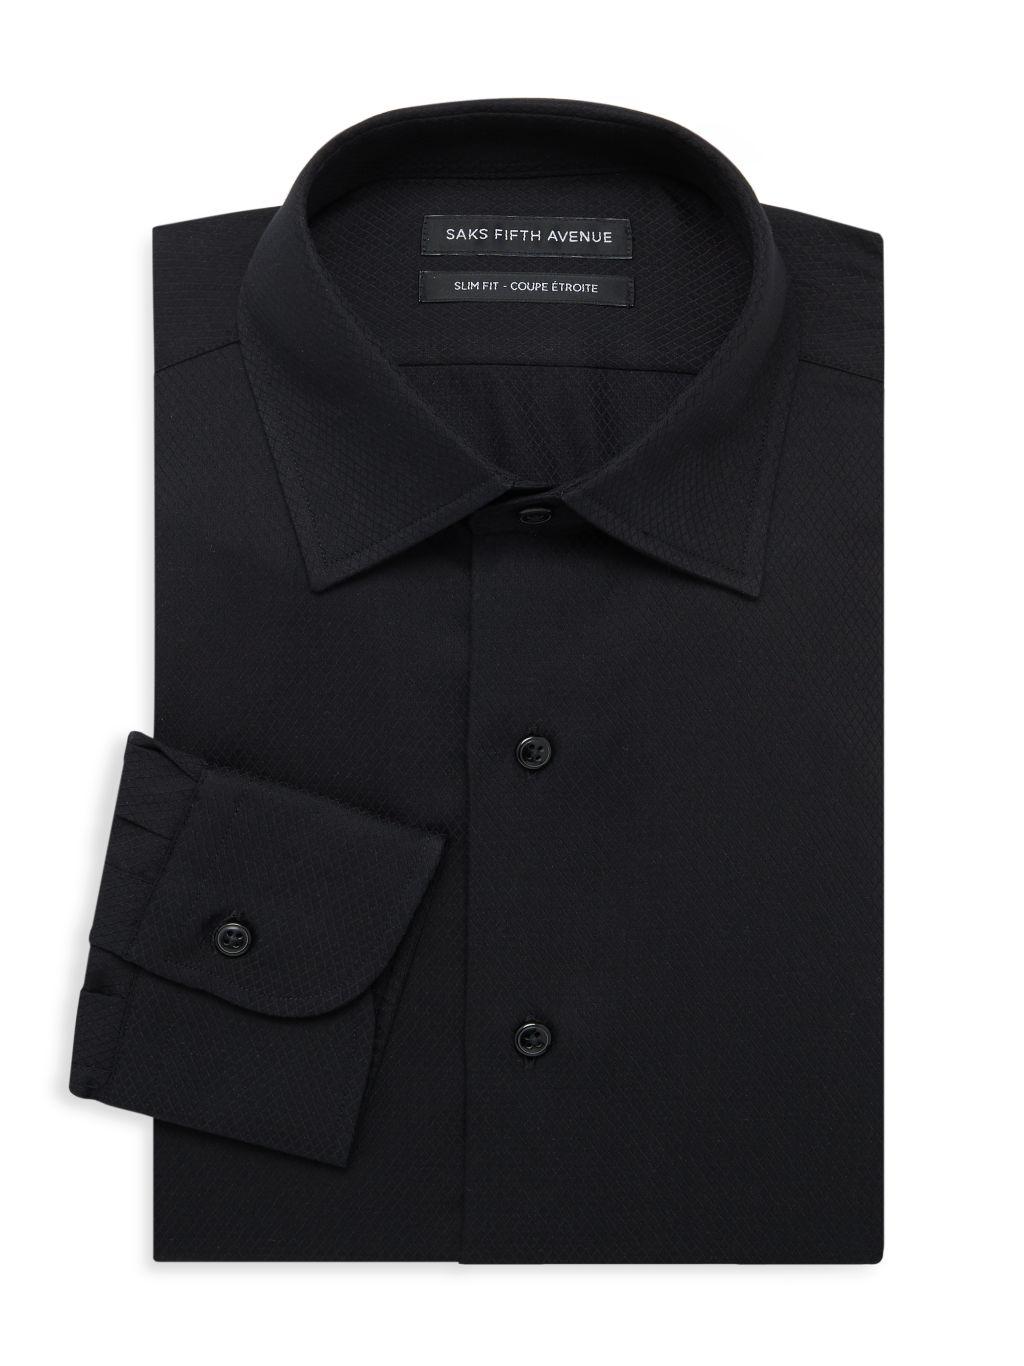 Saks Fifth Avenue Slim-Fit Textured Shirt